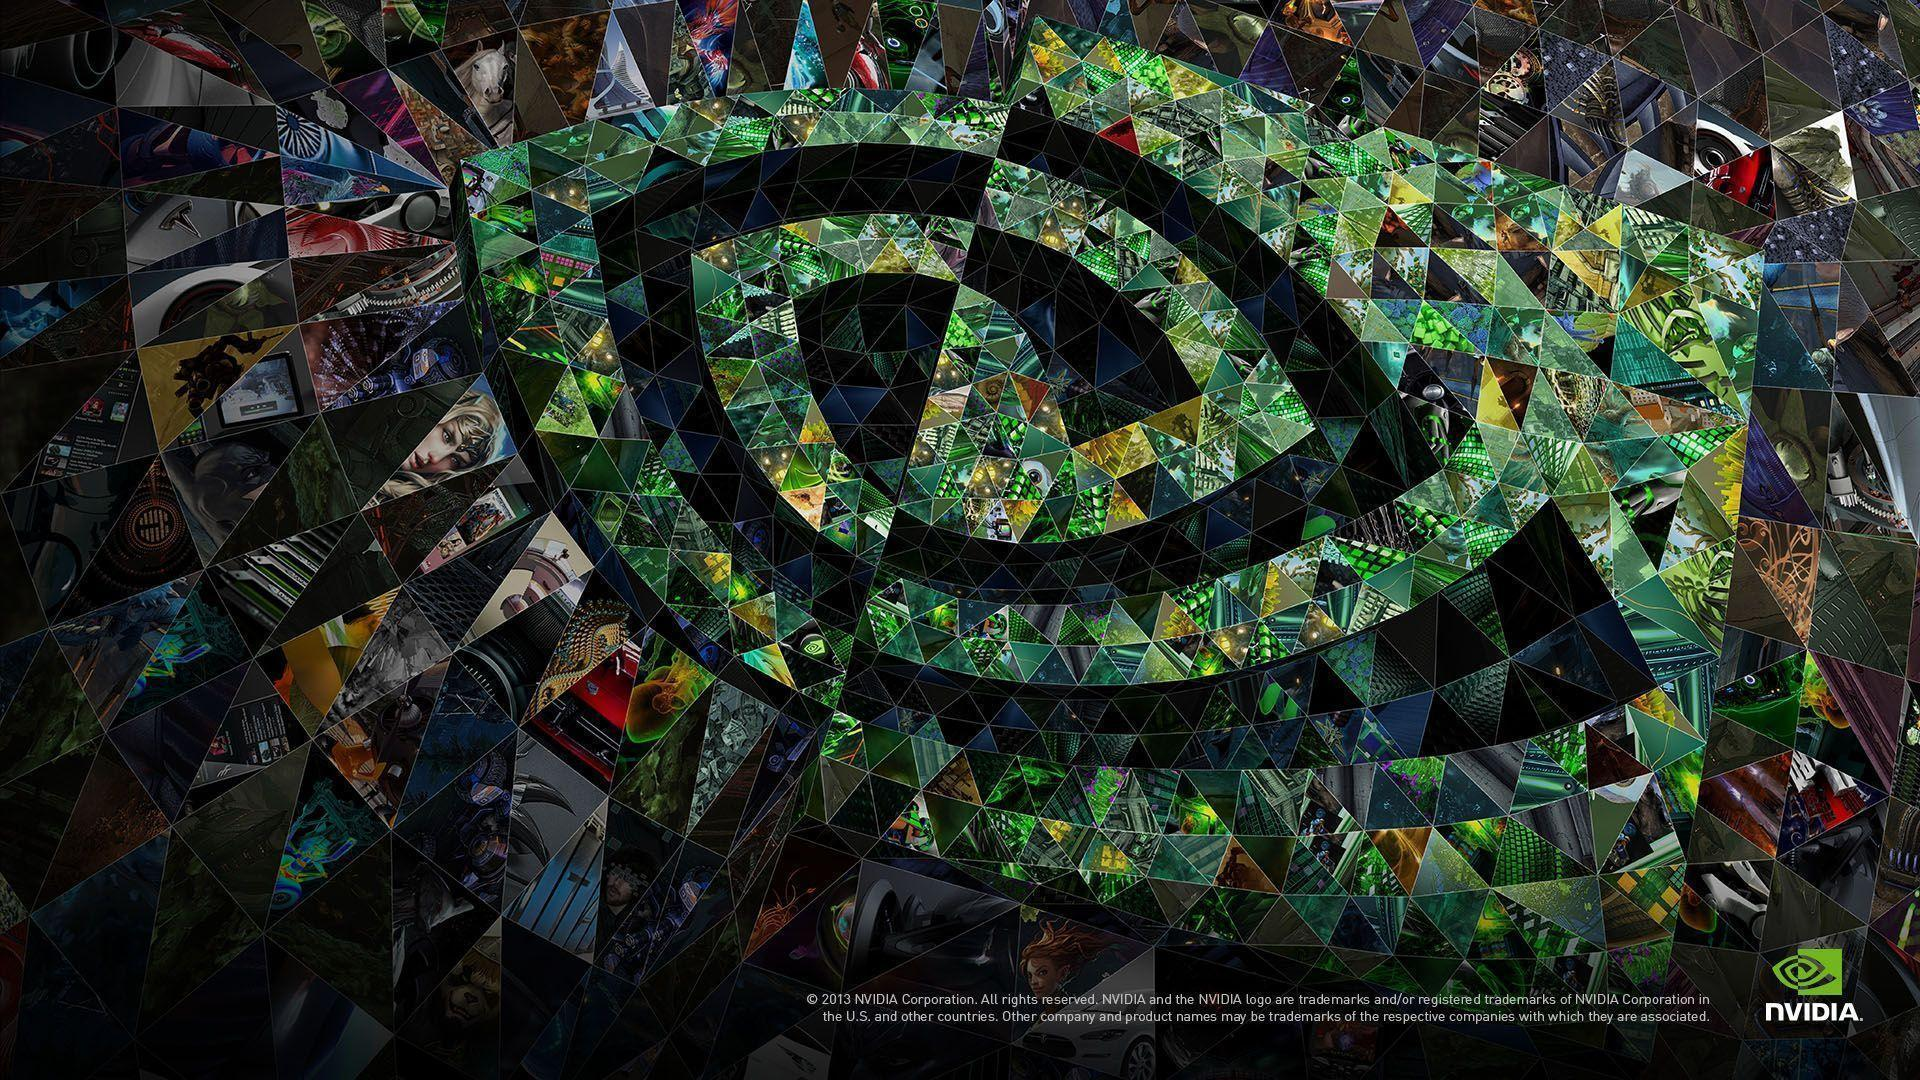 nvidia wallpaper 1600x900 - photo #21